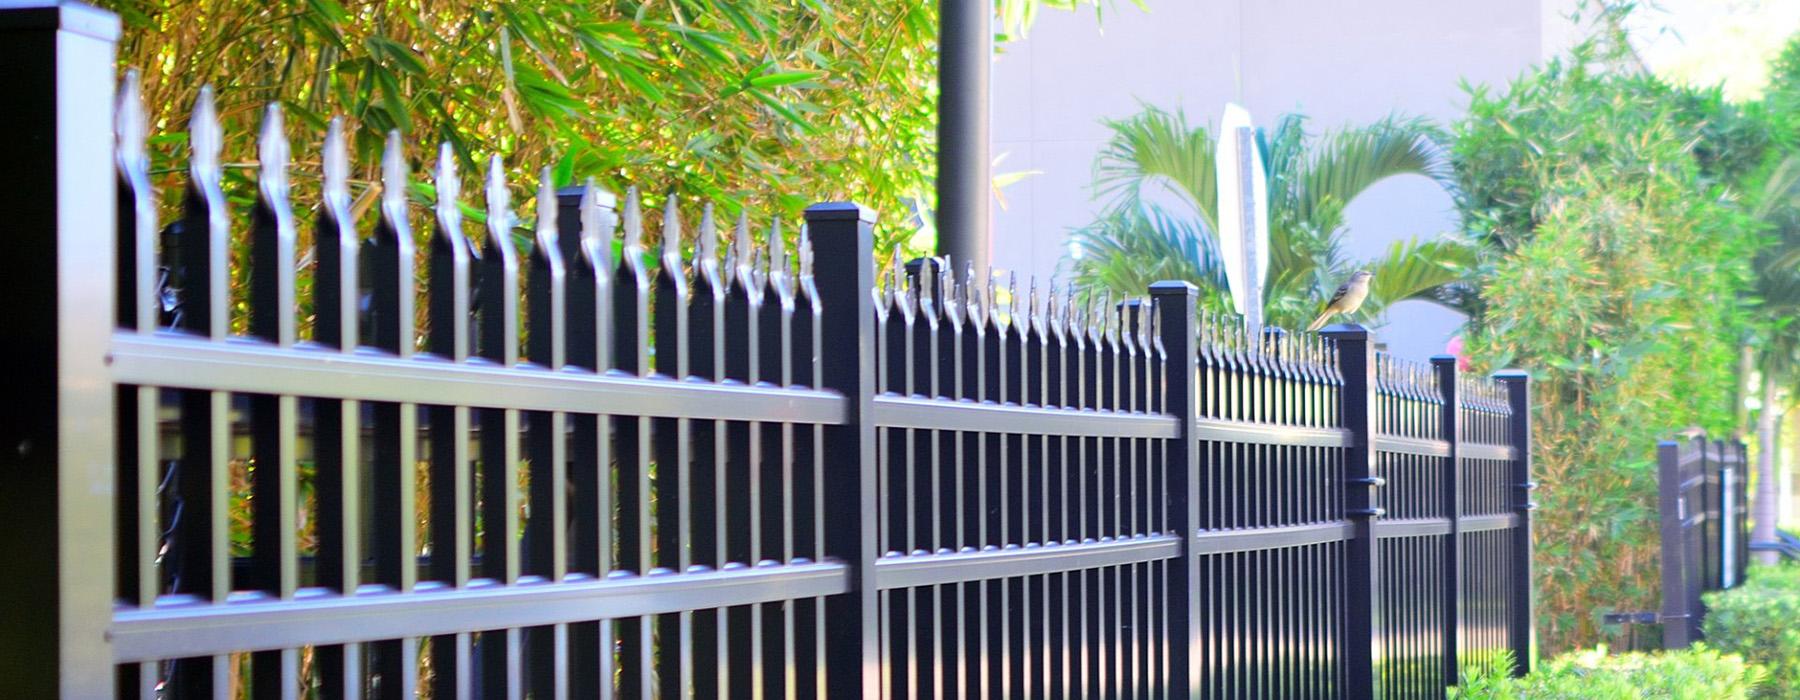 Acura Developments wrought iron fences